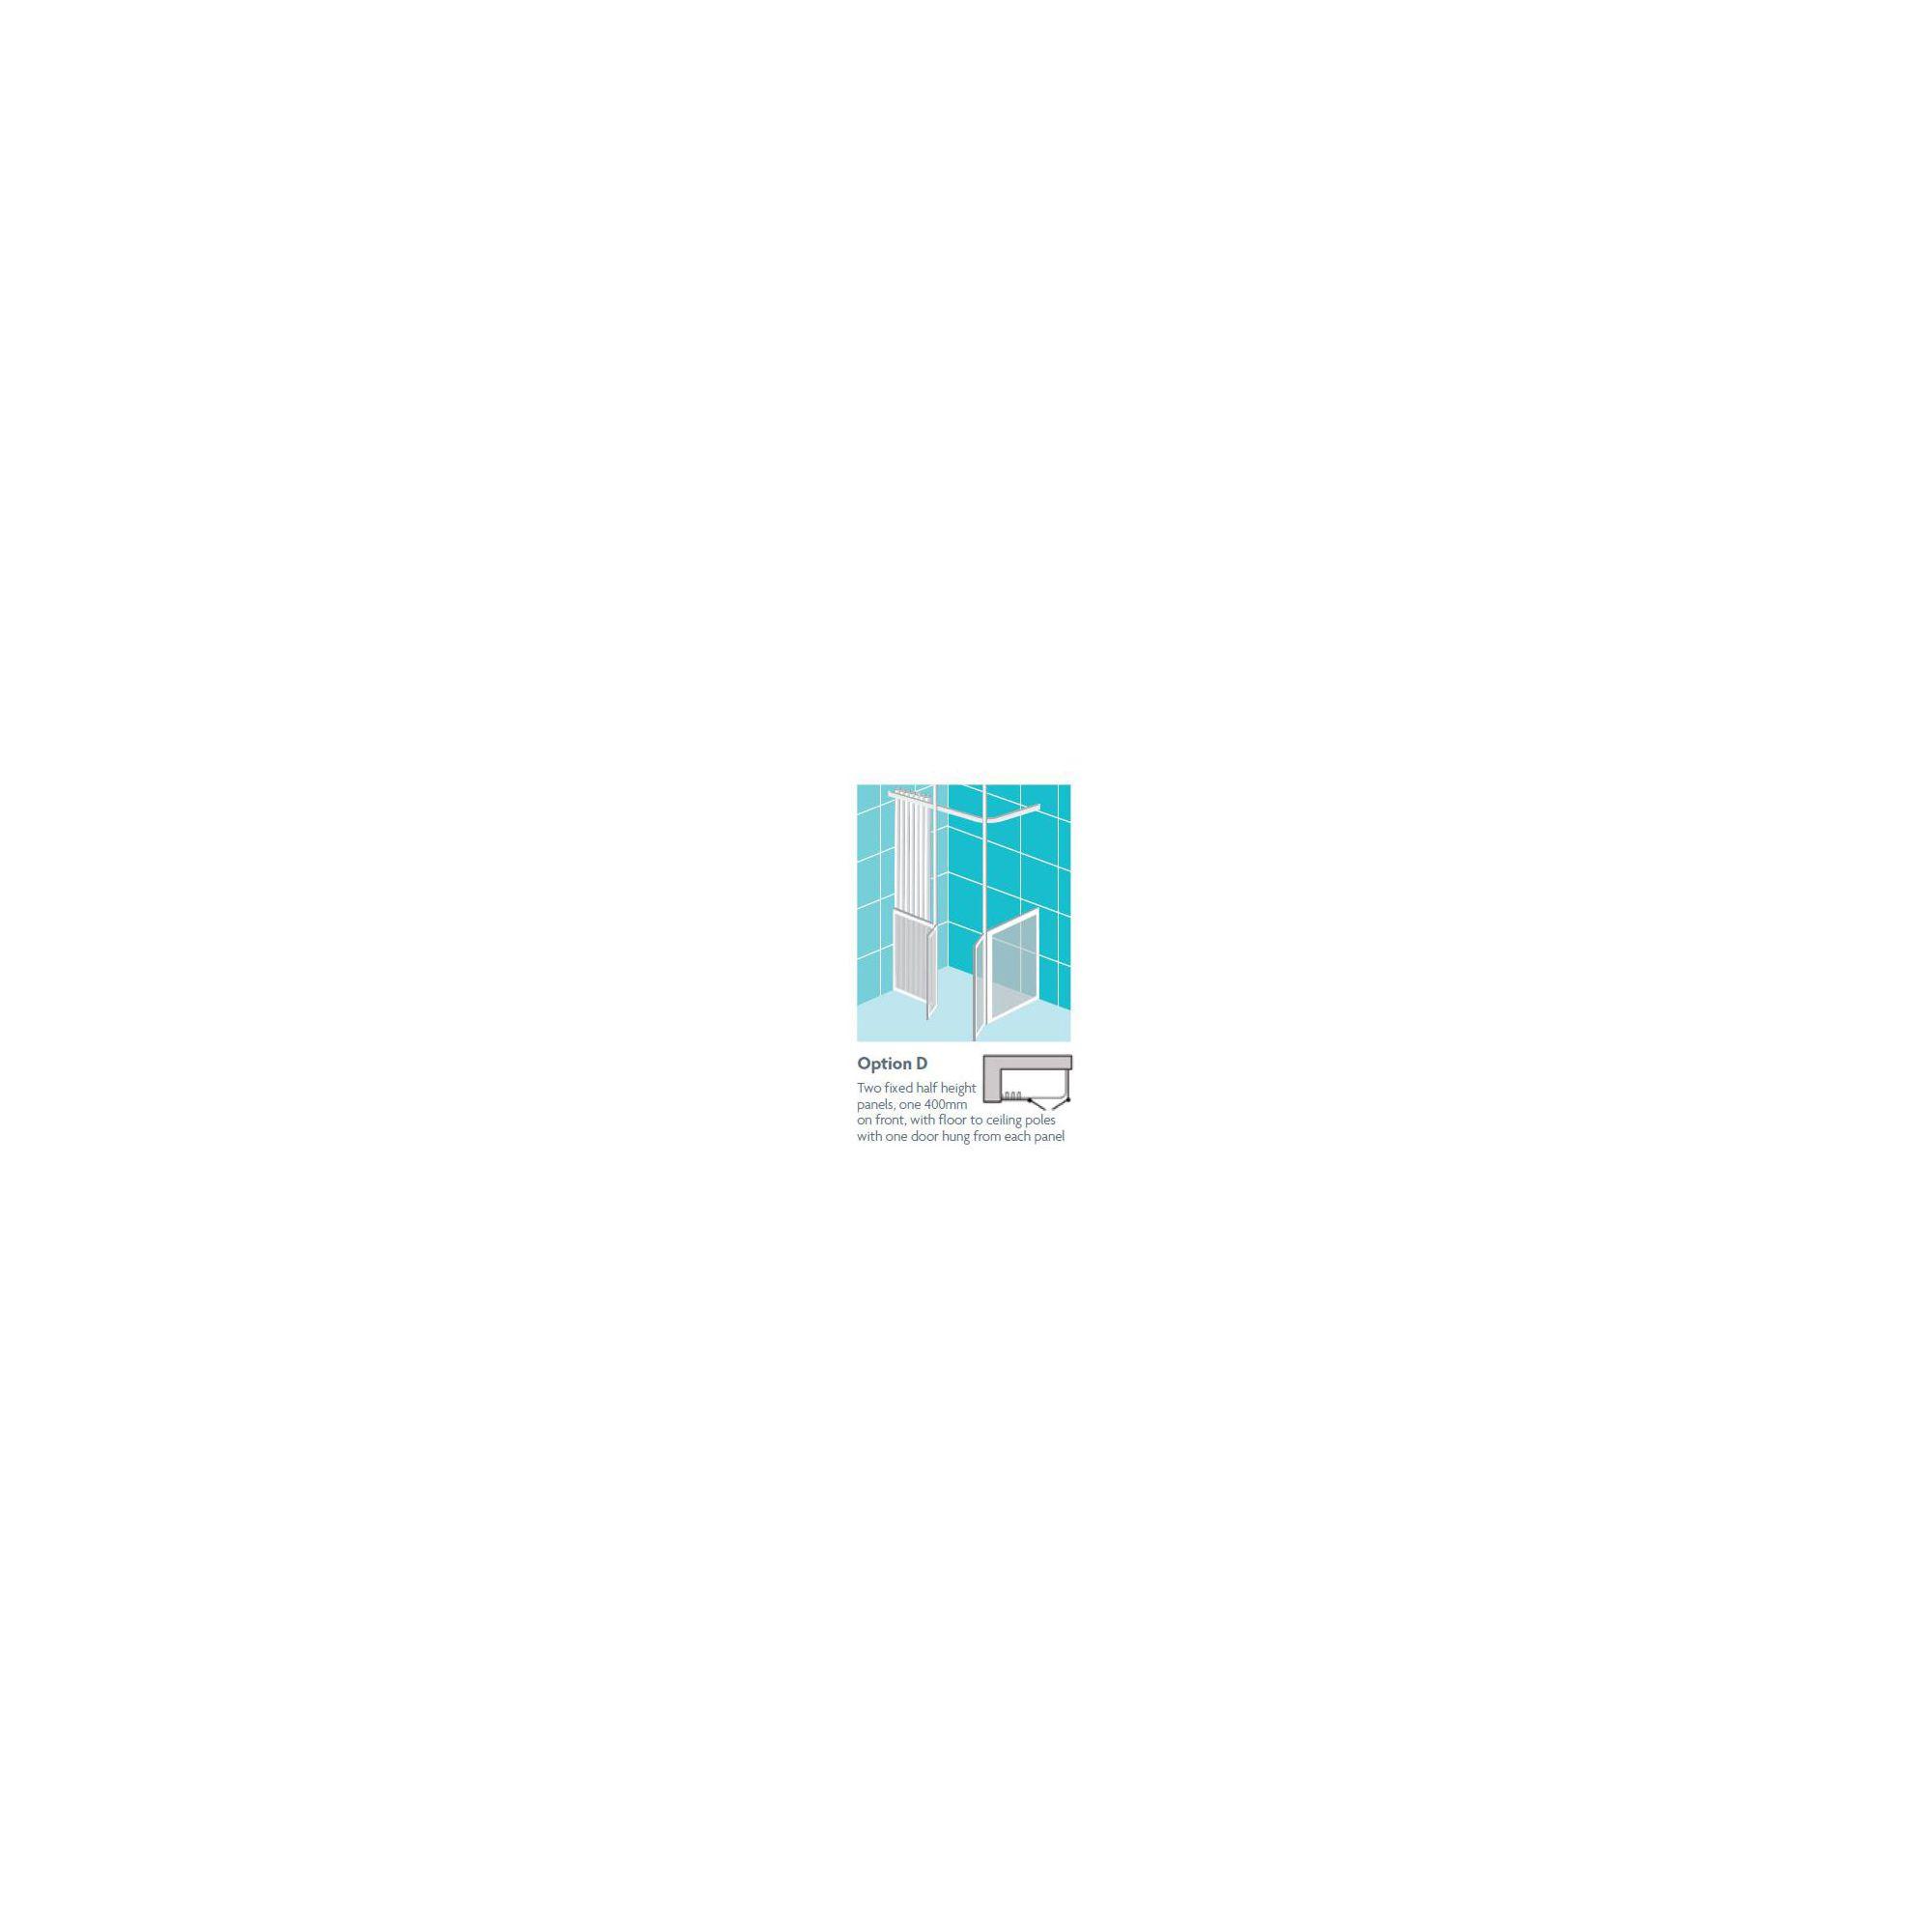 Impey Supreme Corner Door Option D Left Hand 1250mm x 830mm at Tesco Direct